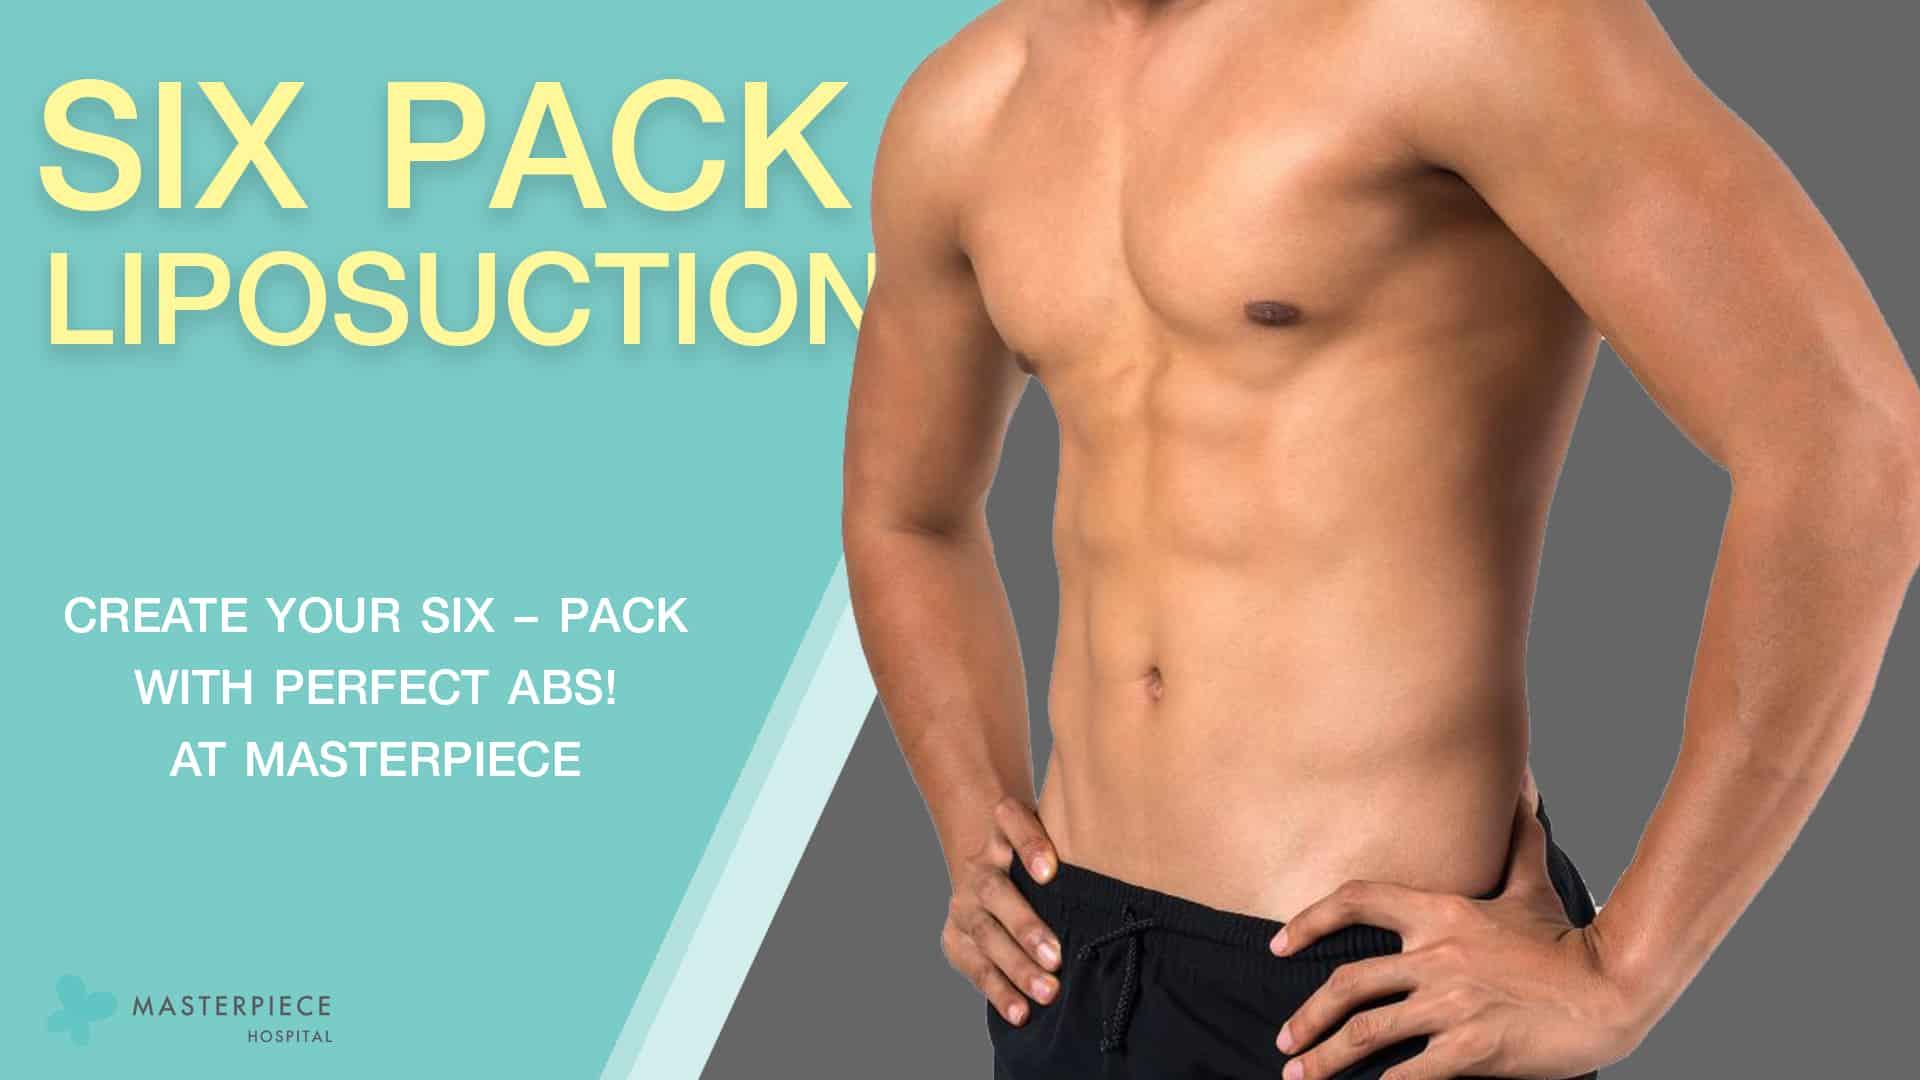 Six Pack Abs Vaser Liposuction Masterpiece Hospital